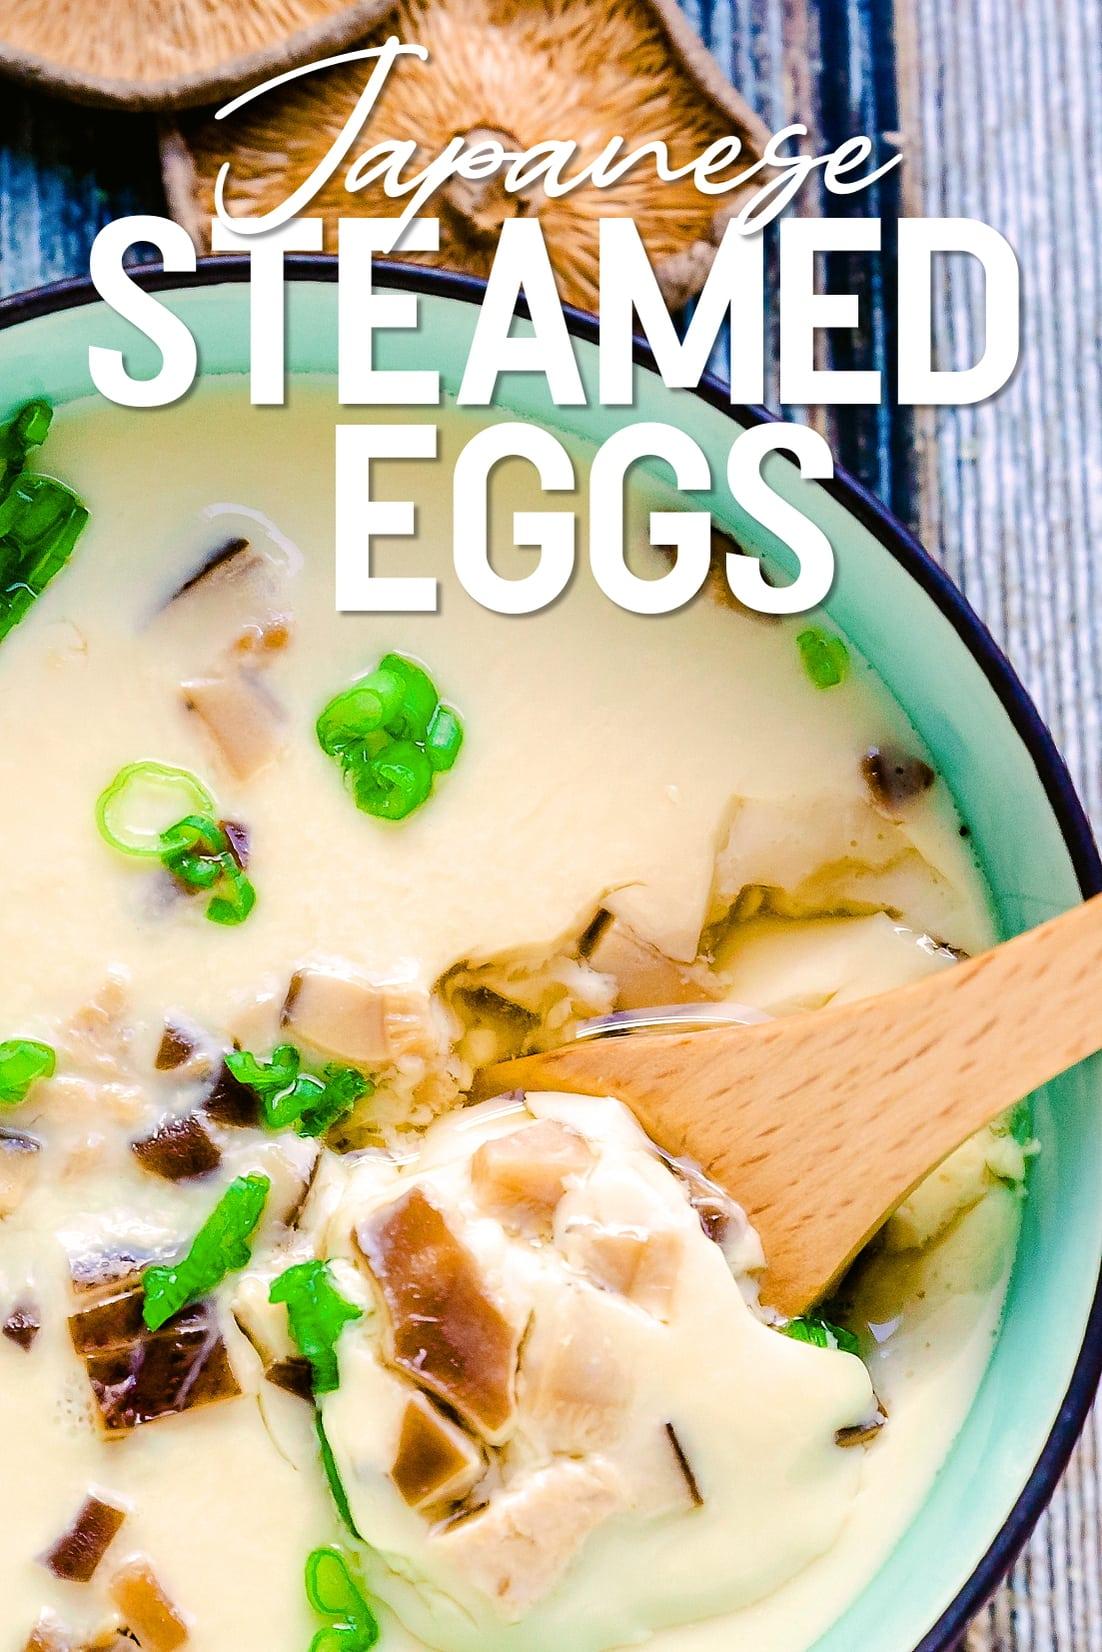 Shiitake Steamed Eggs close up